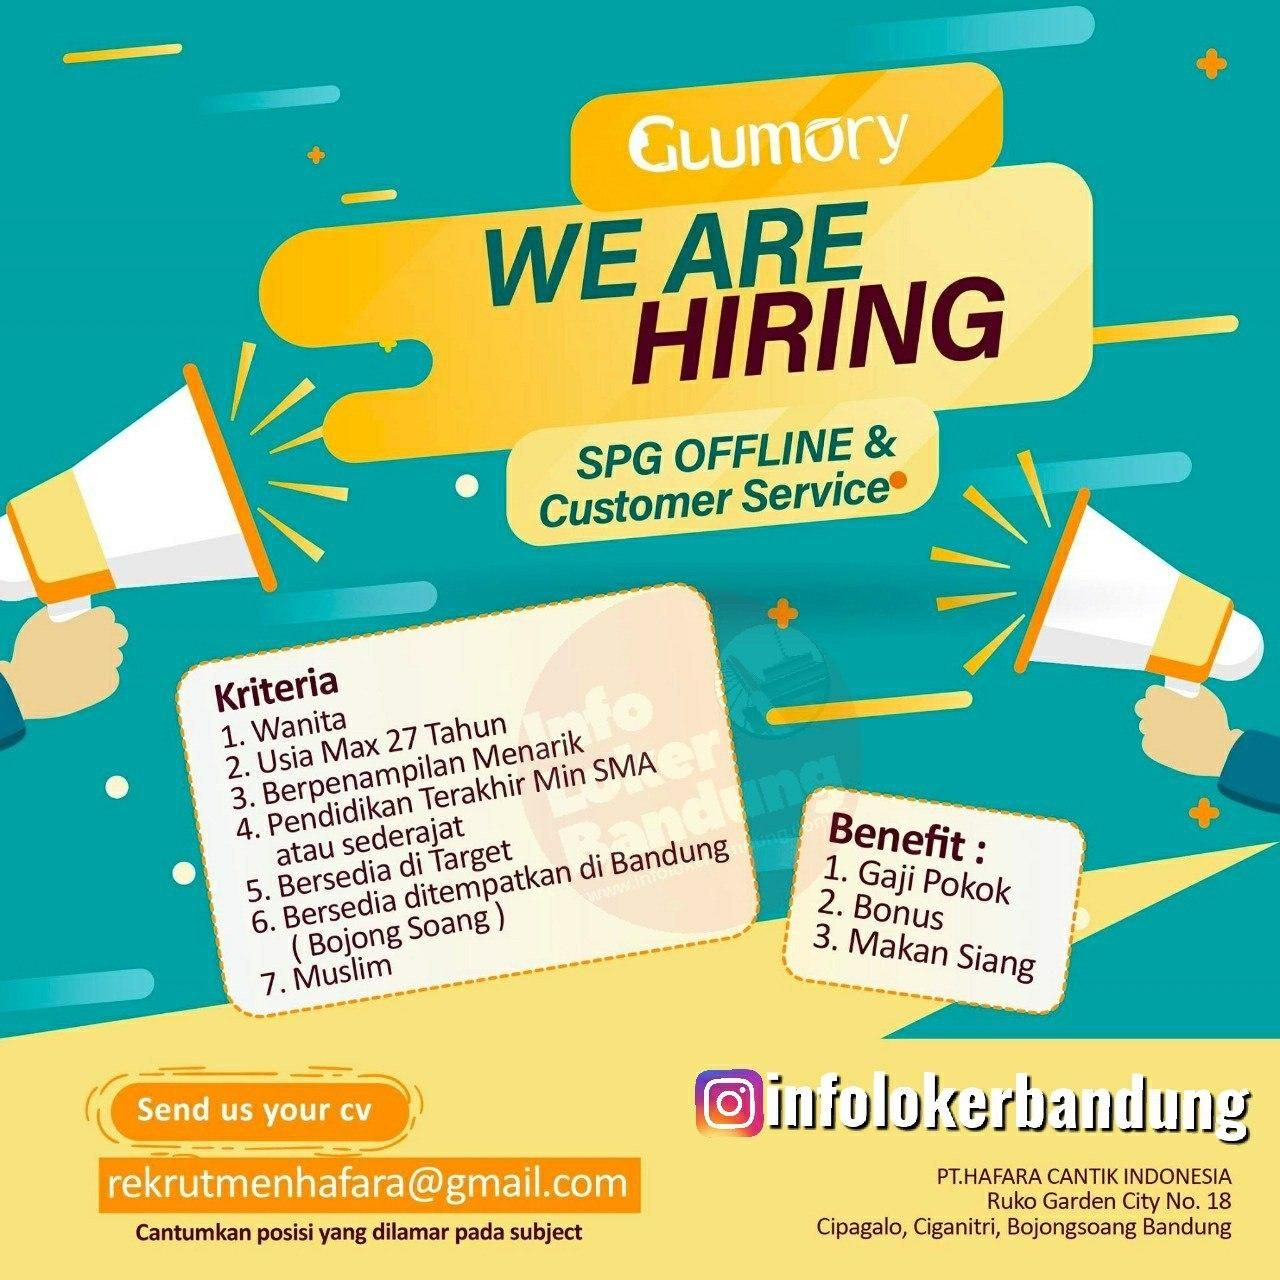 Lowongan Kerja SPG Offline & Customer Service Glomory